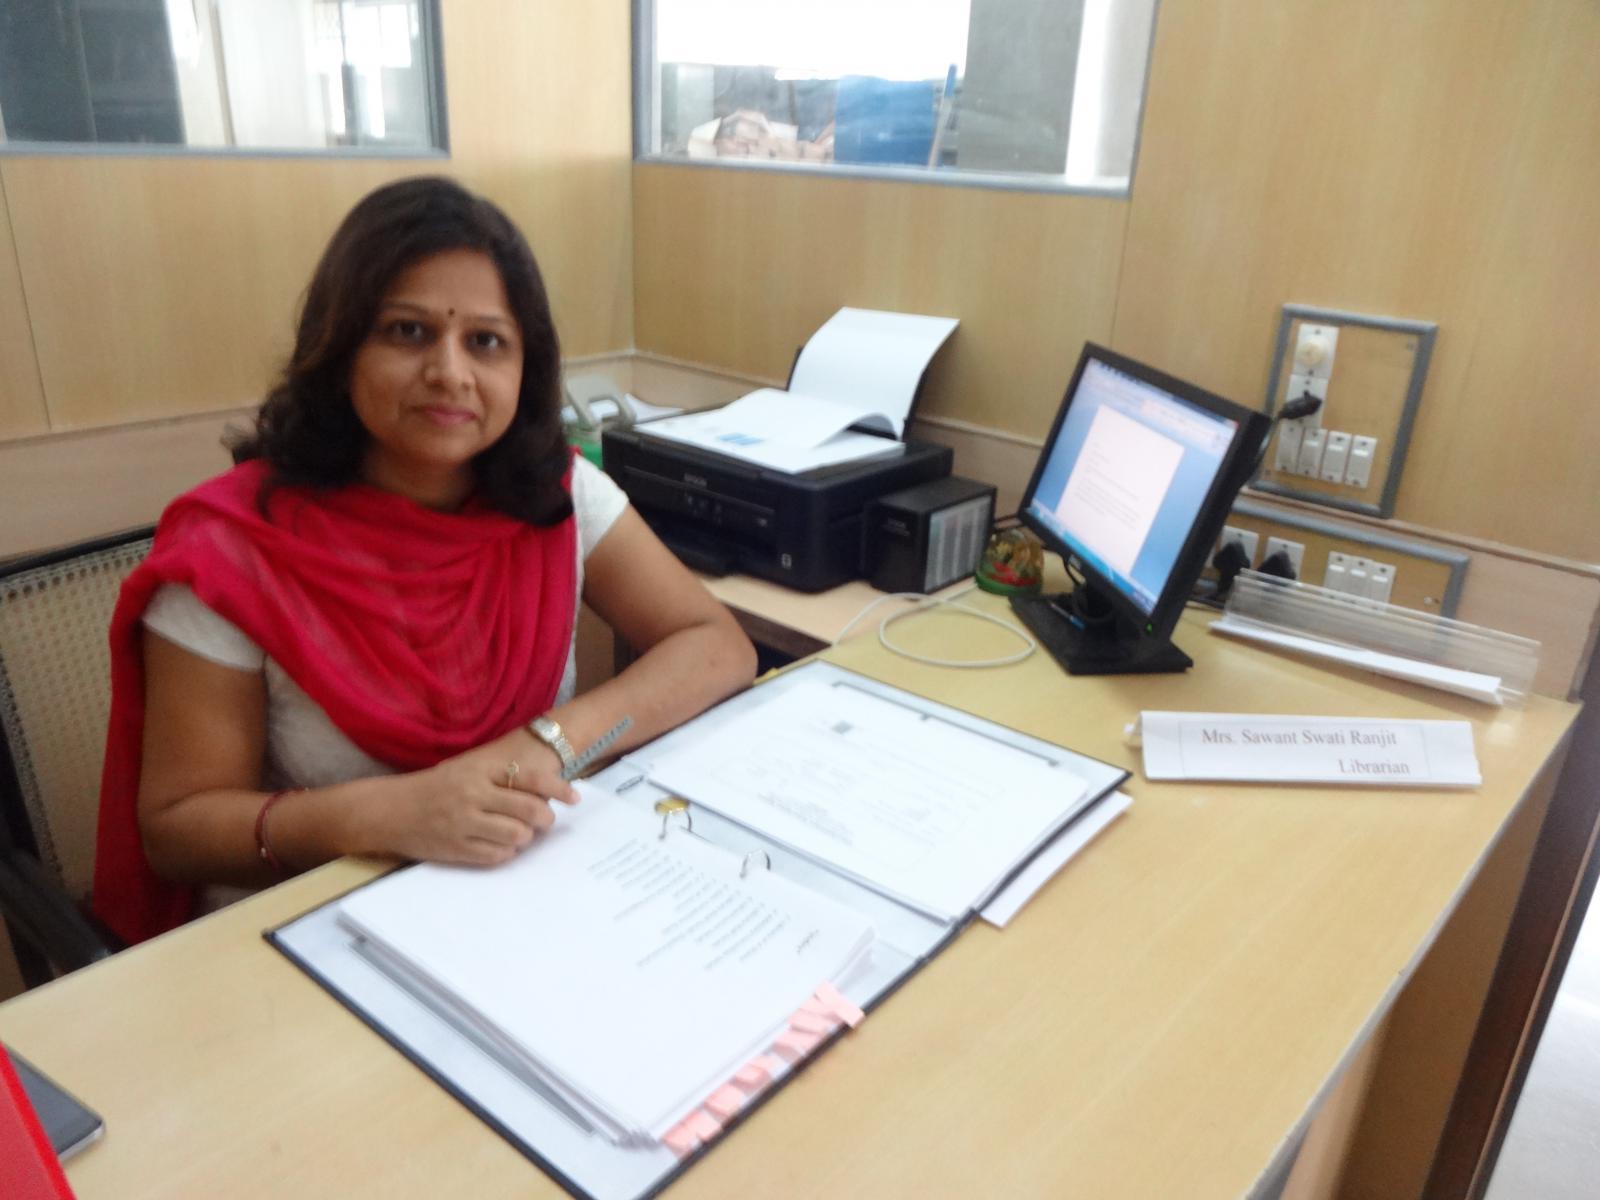 Mrs. Swati Ranjit Sawant